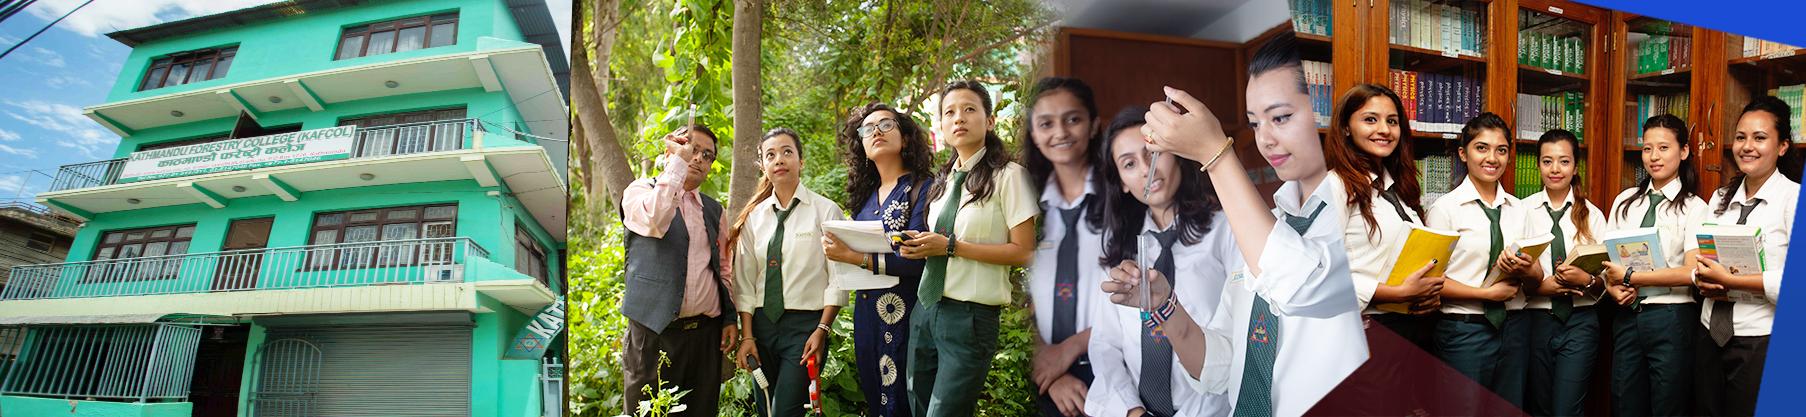 Kathmandu Forestry College